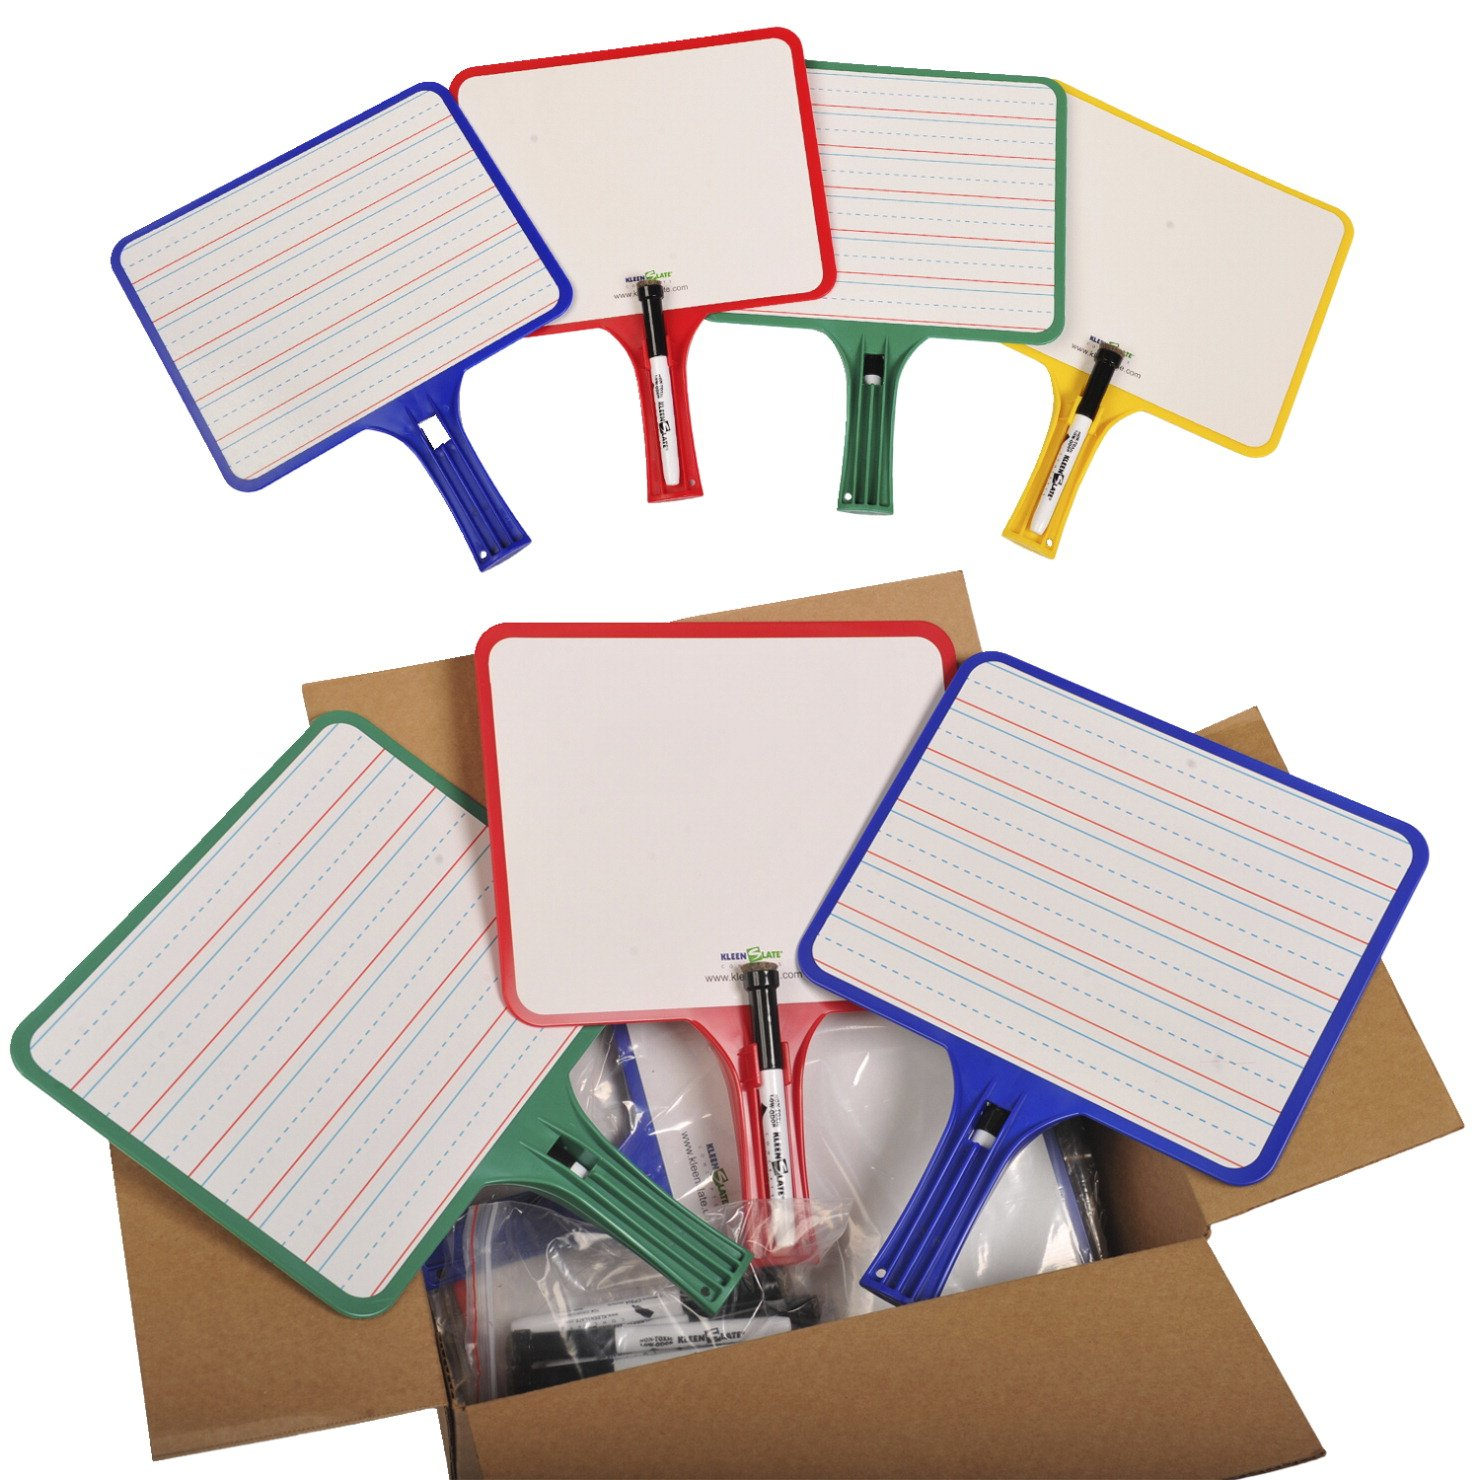 KleenSlate KLS50027051 Hand Held Dry Erase Rectangular Paddle Classroom Kit, Blank/Handwriting (Pack of 32)